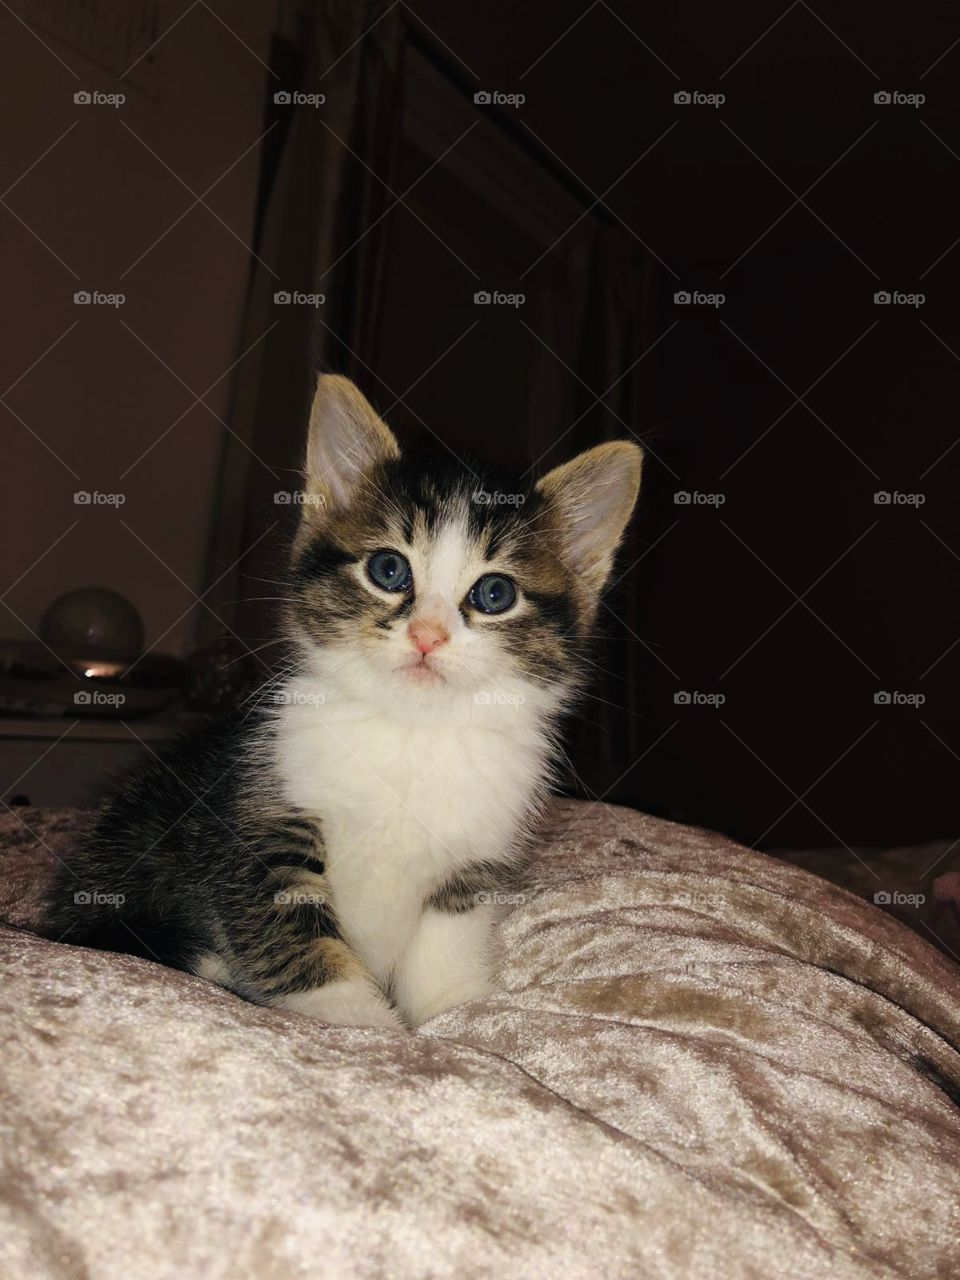 Cutie kitty 🐱